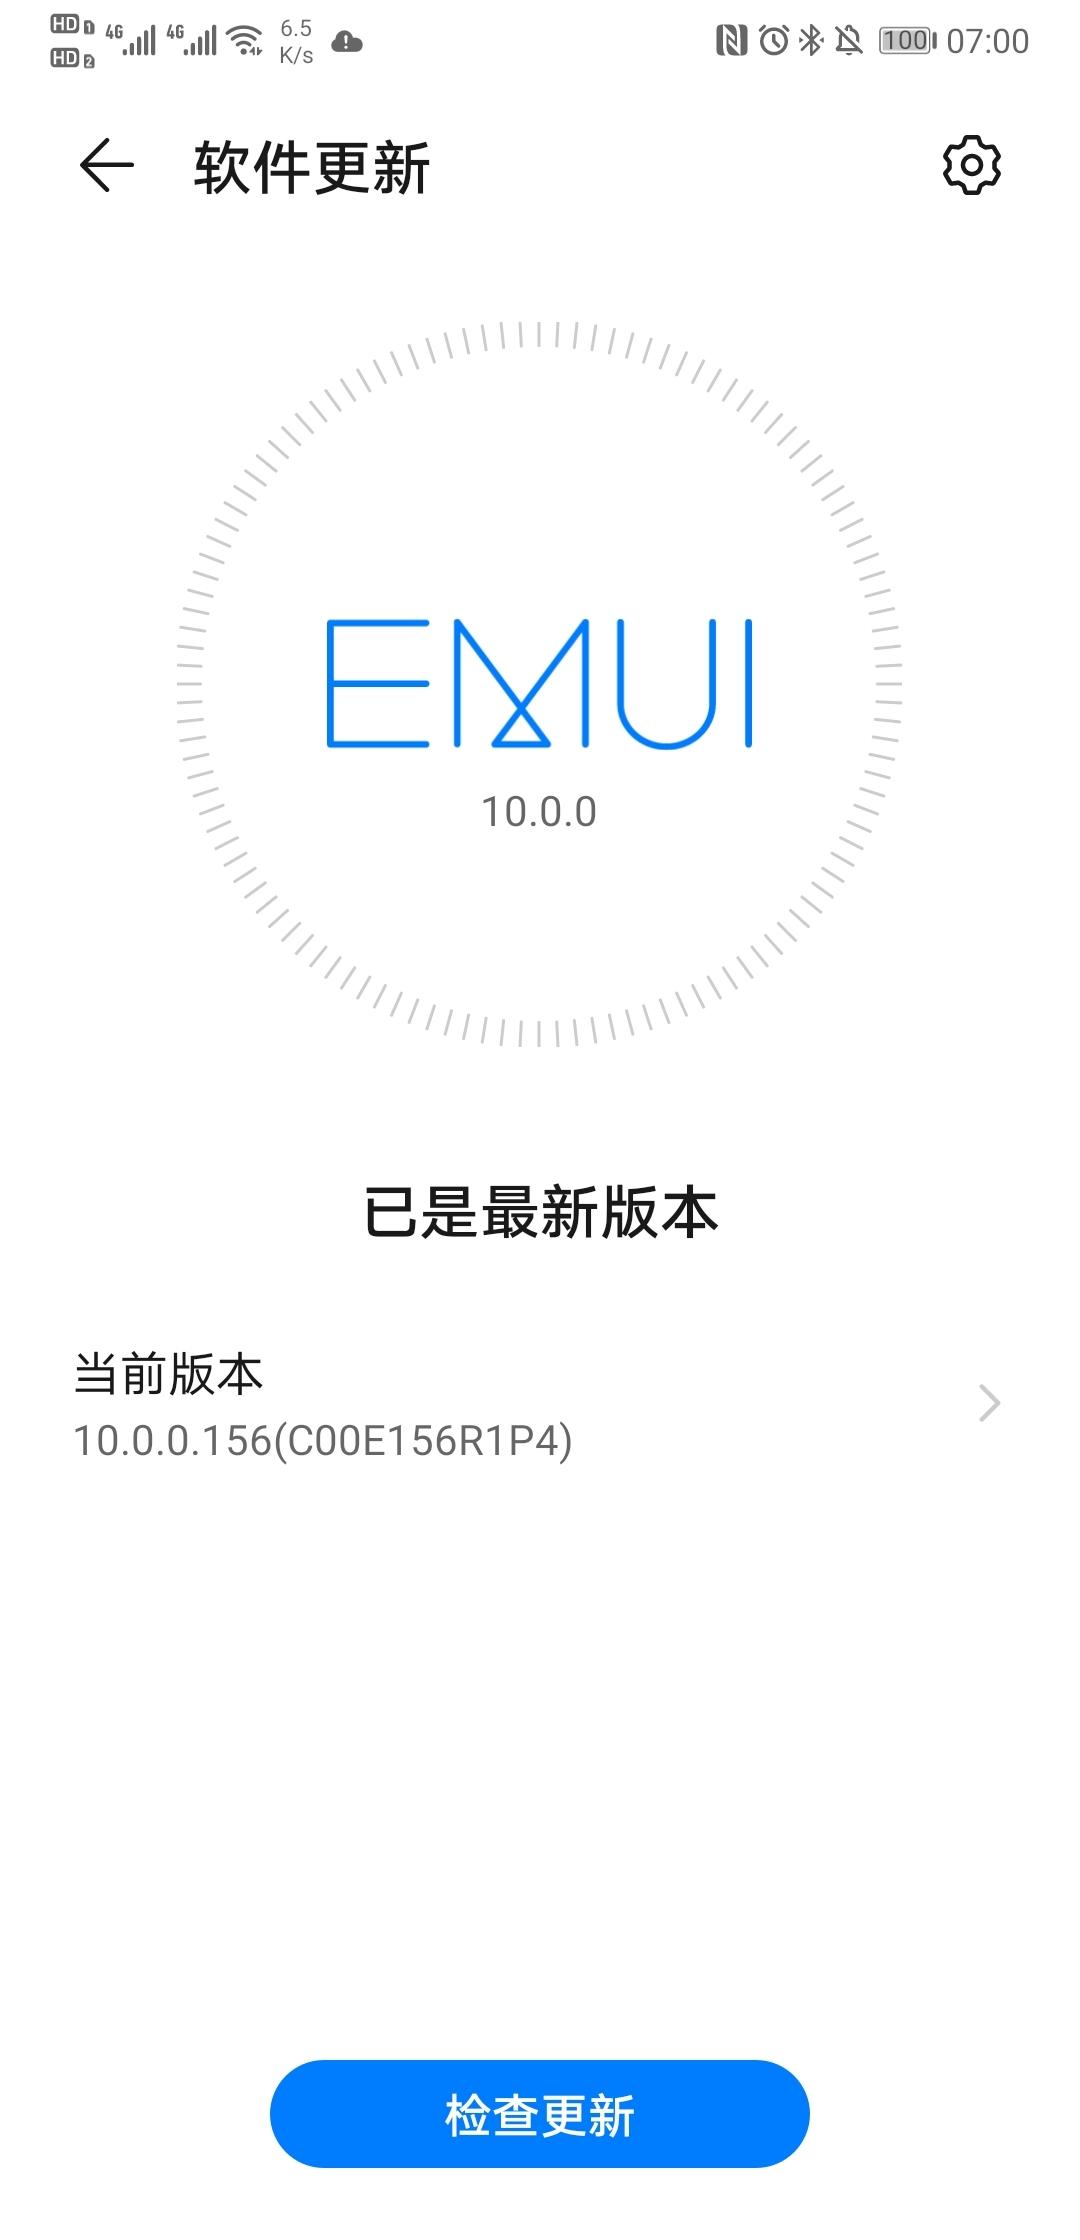 Screenshot_20200516_070059_com.huawei.android.hwouc.jpg